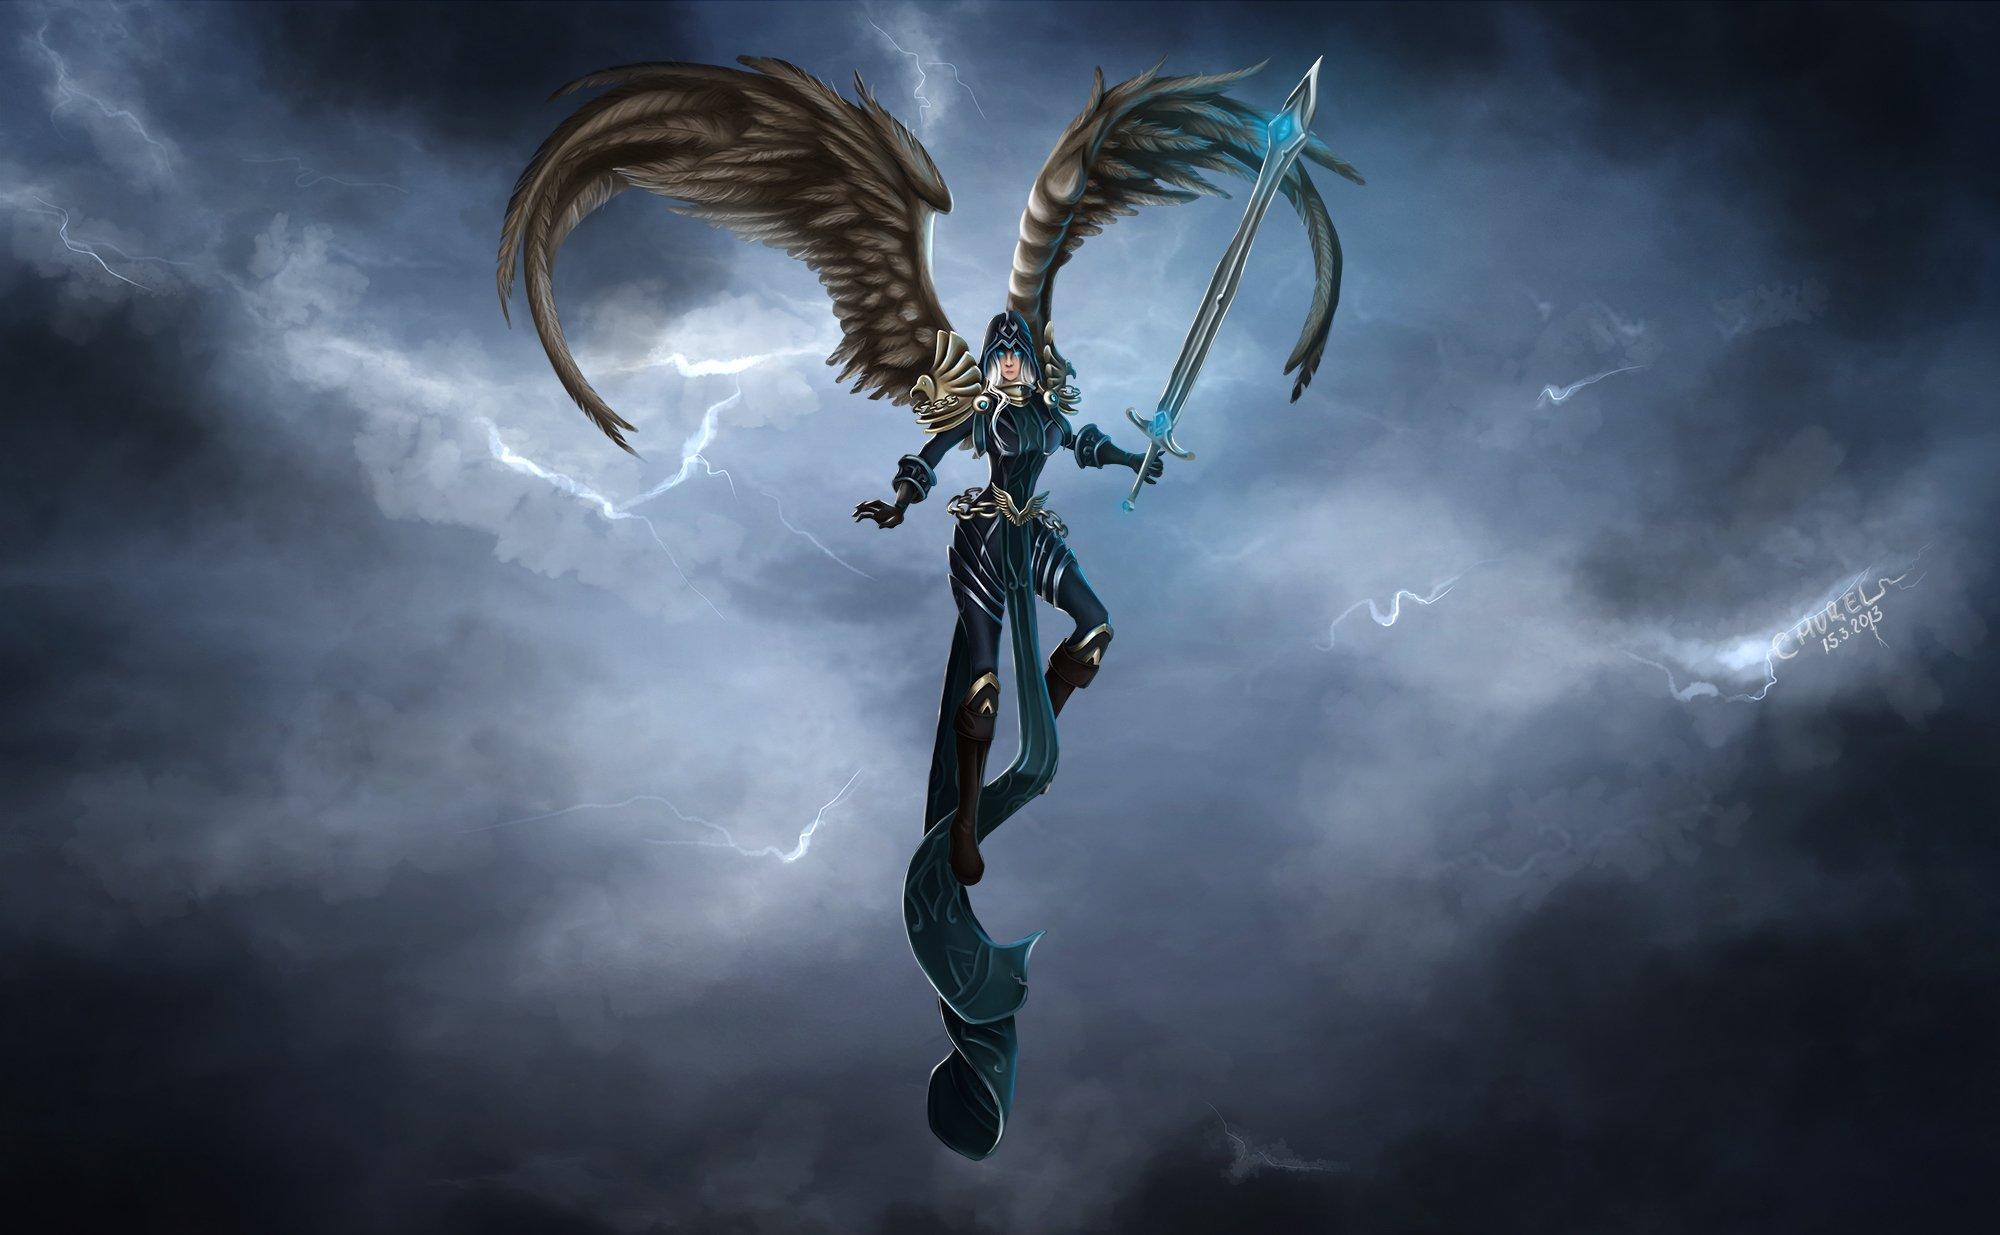 Warrior Kayle Swords Wings Games Fantasy angel wallpaper background 2000x1235